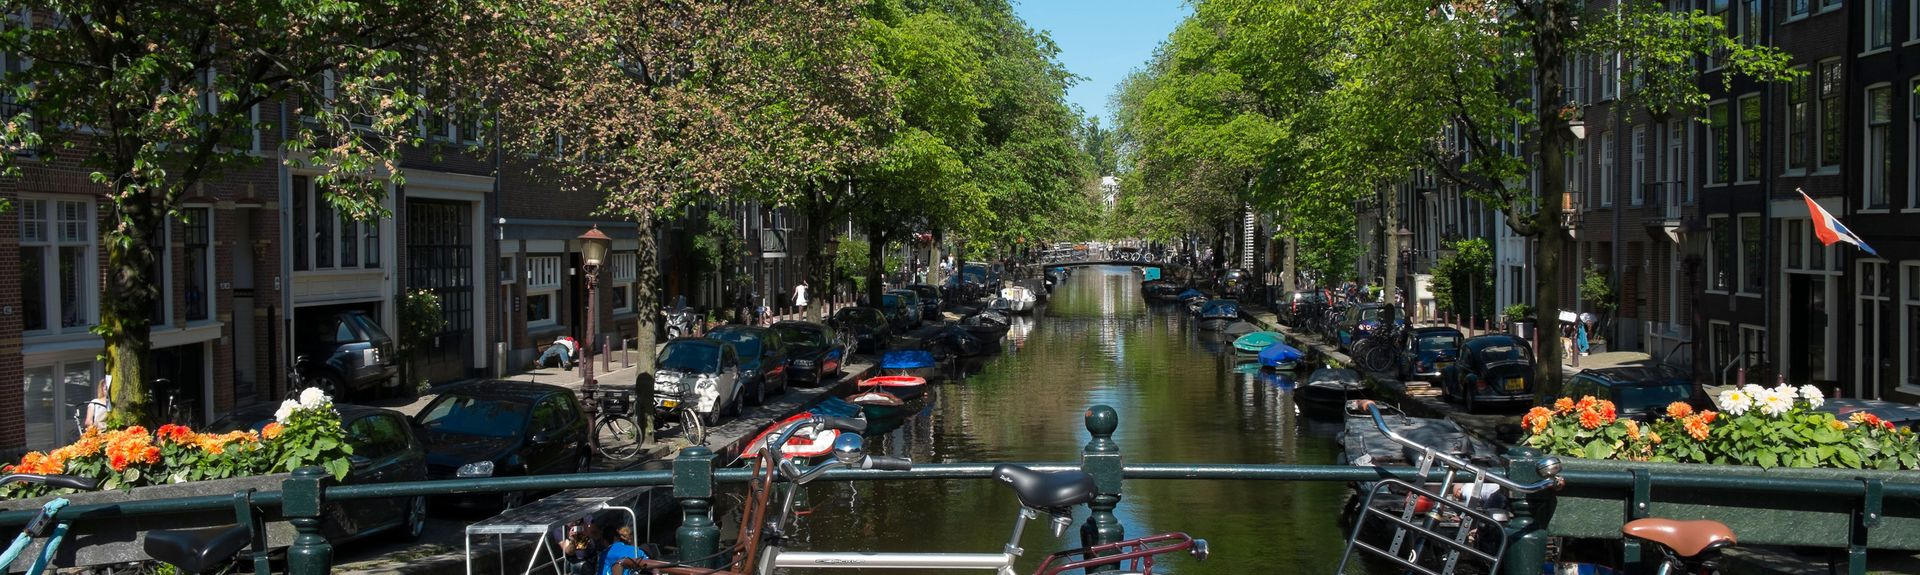 Jordaan, Amsterdam, Noord-Holland, Nederland